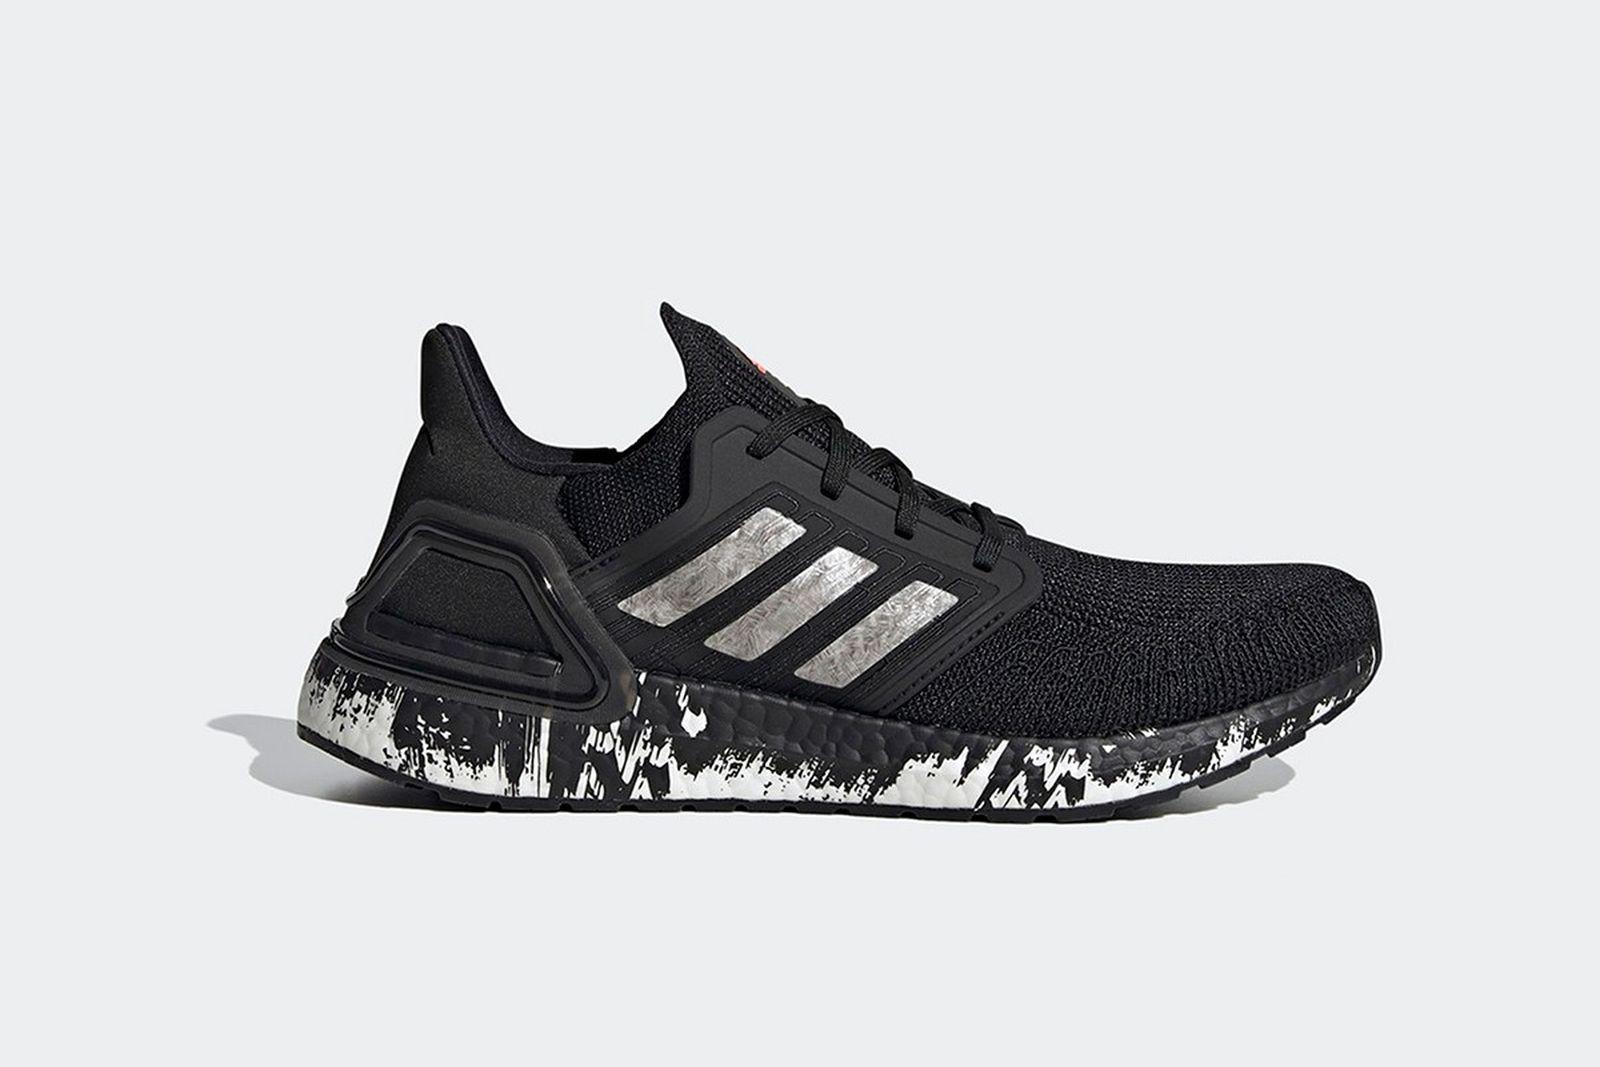 adidas-ultraboost-20-new-main1